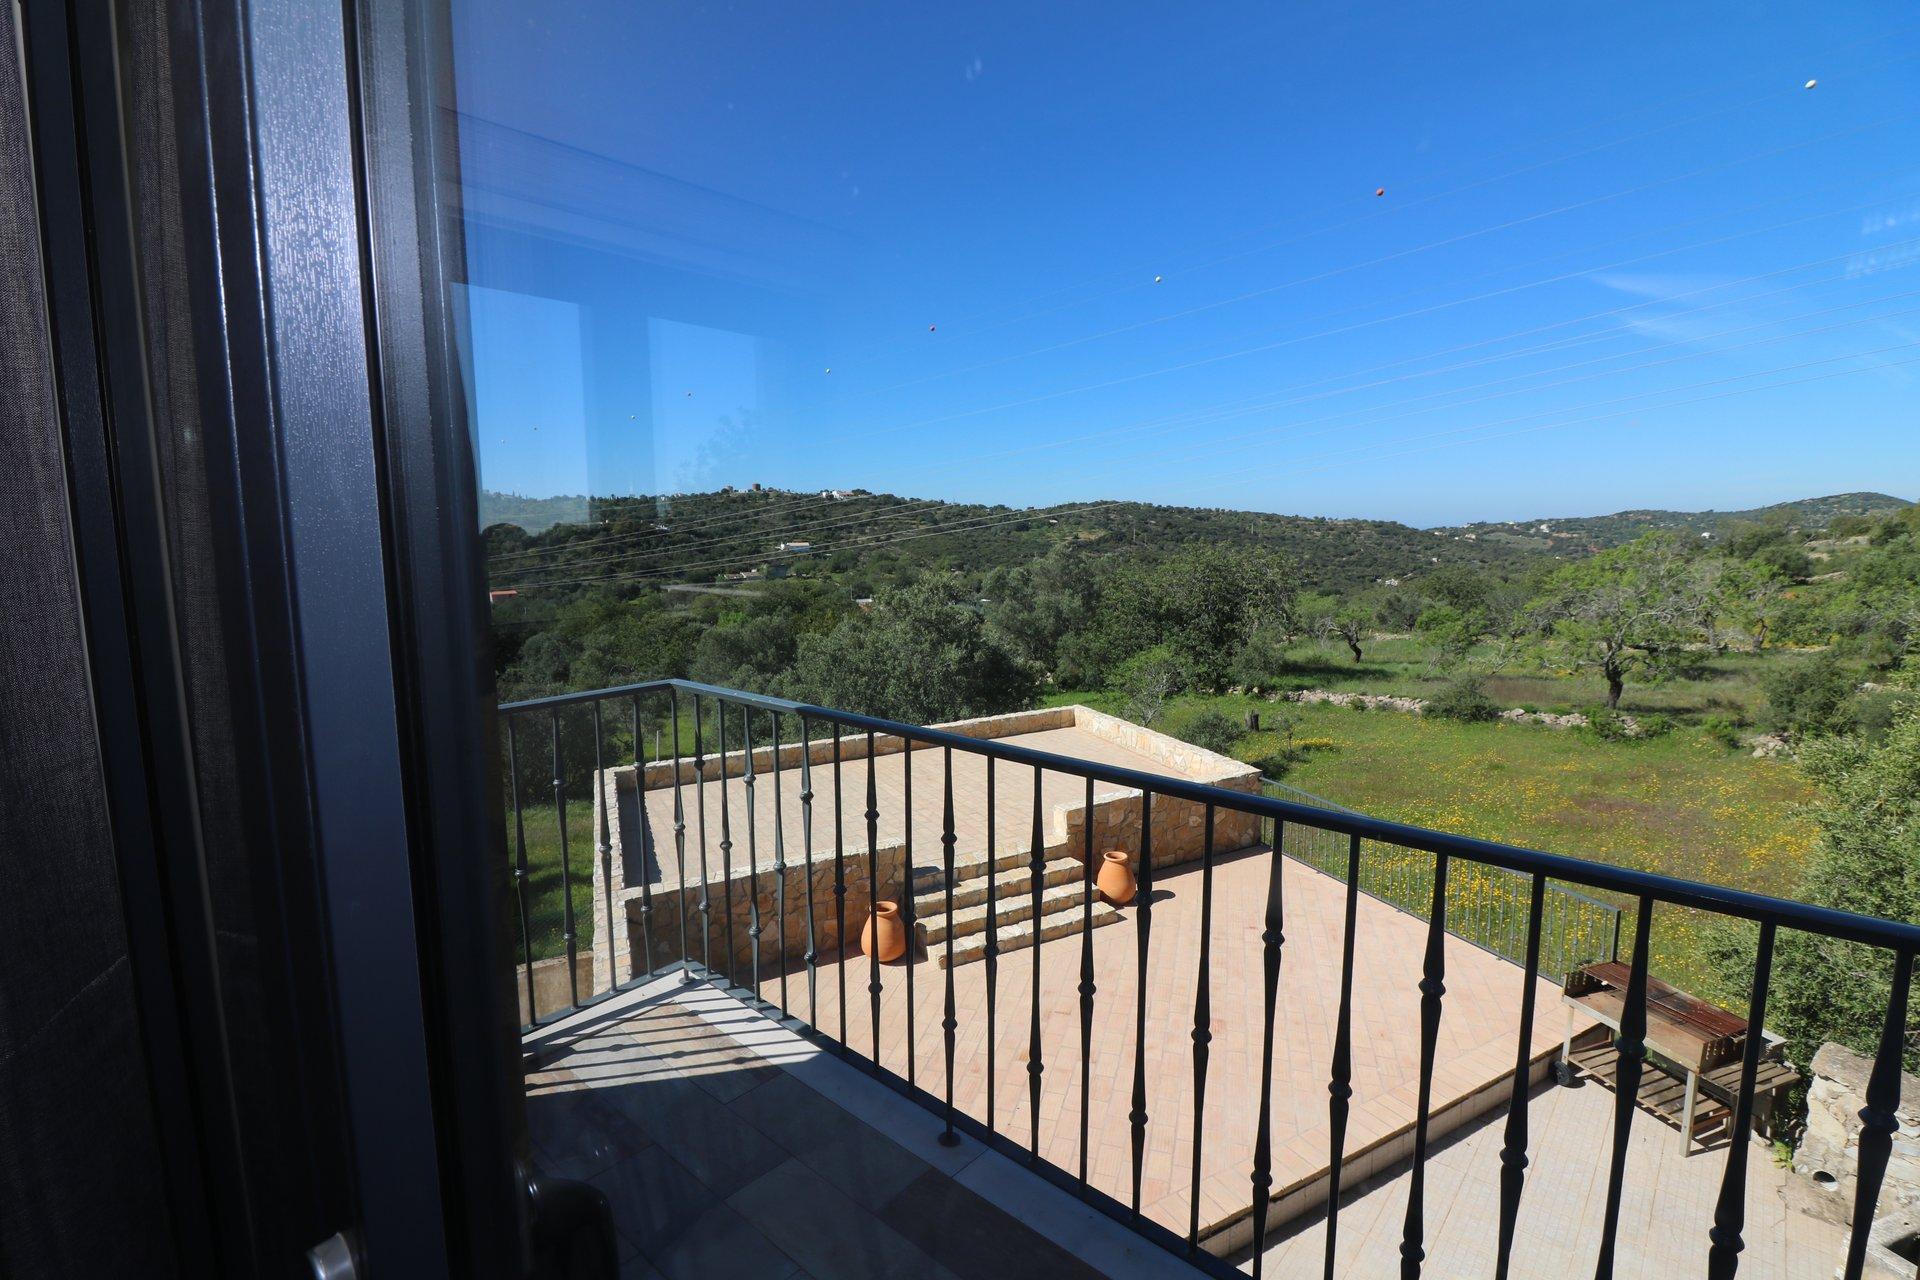 4 Bedroom Villa Estoi, Central Algarve Ref: JV10379